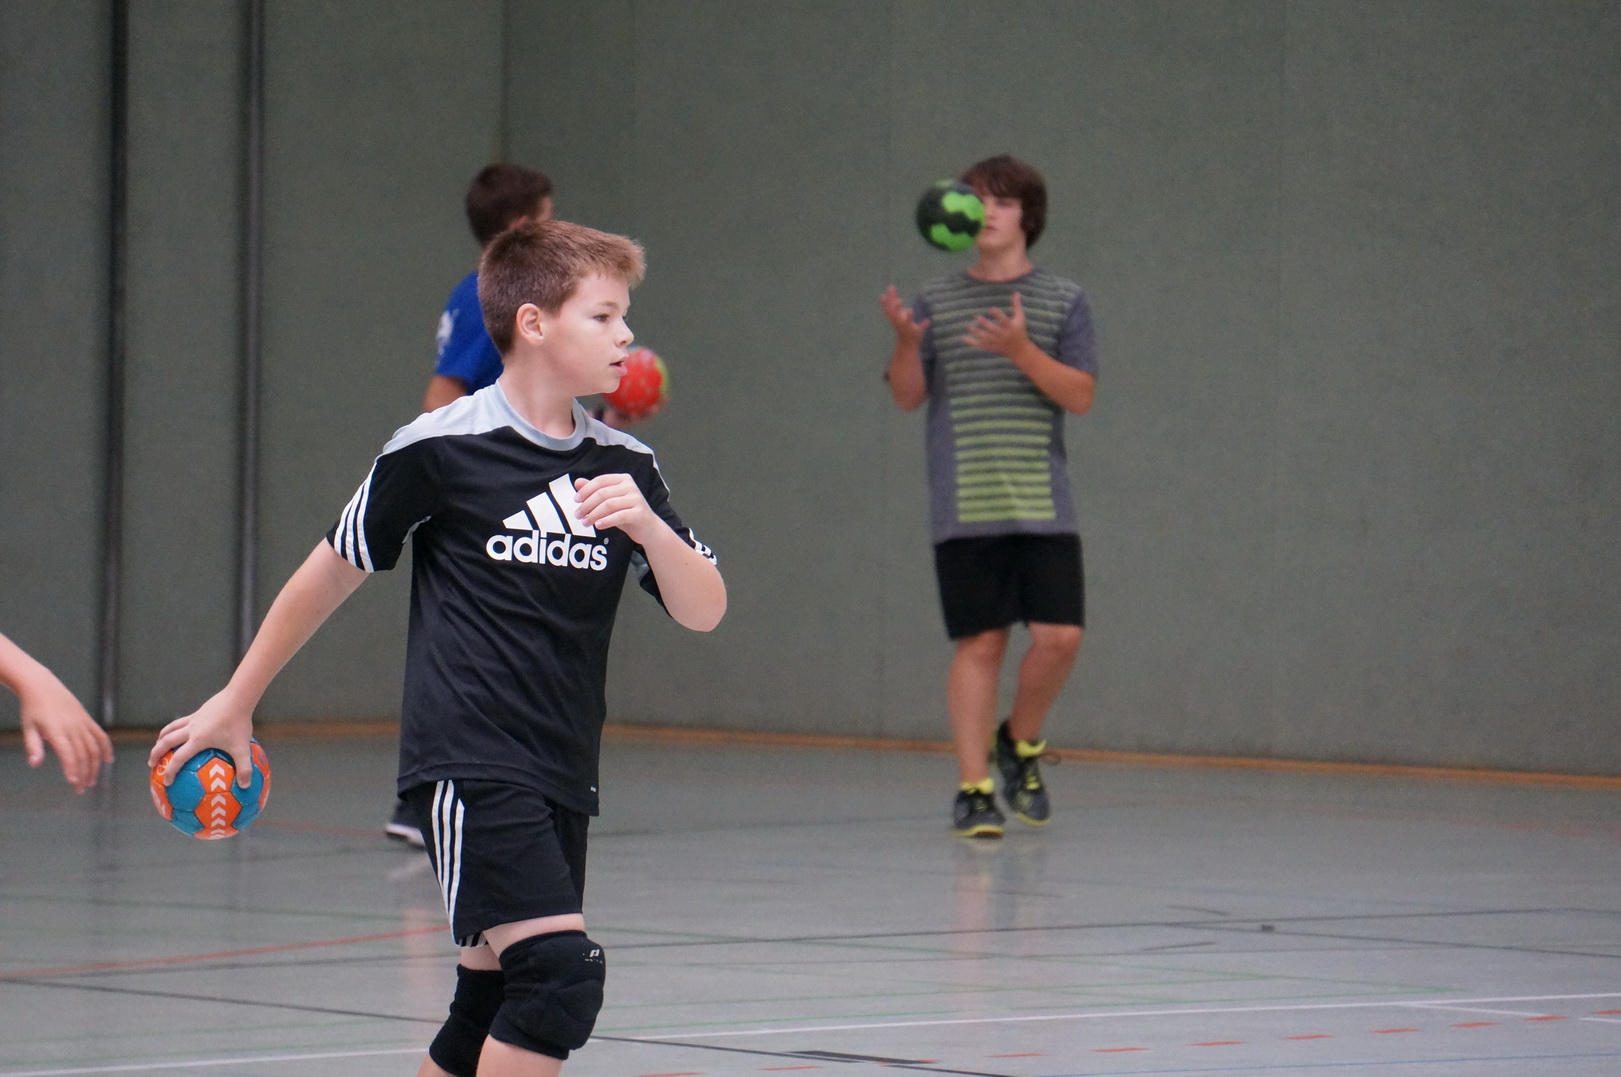 201808_Handballcamp_SDH_MG_156w